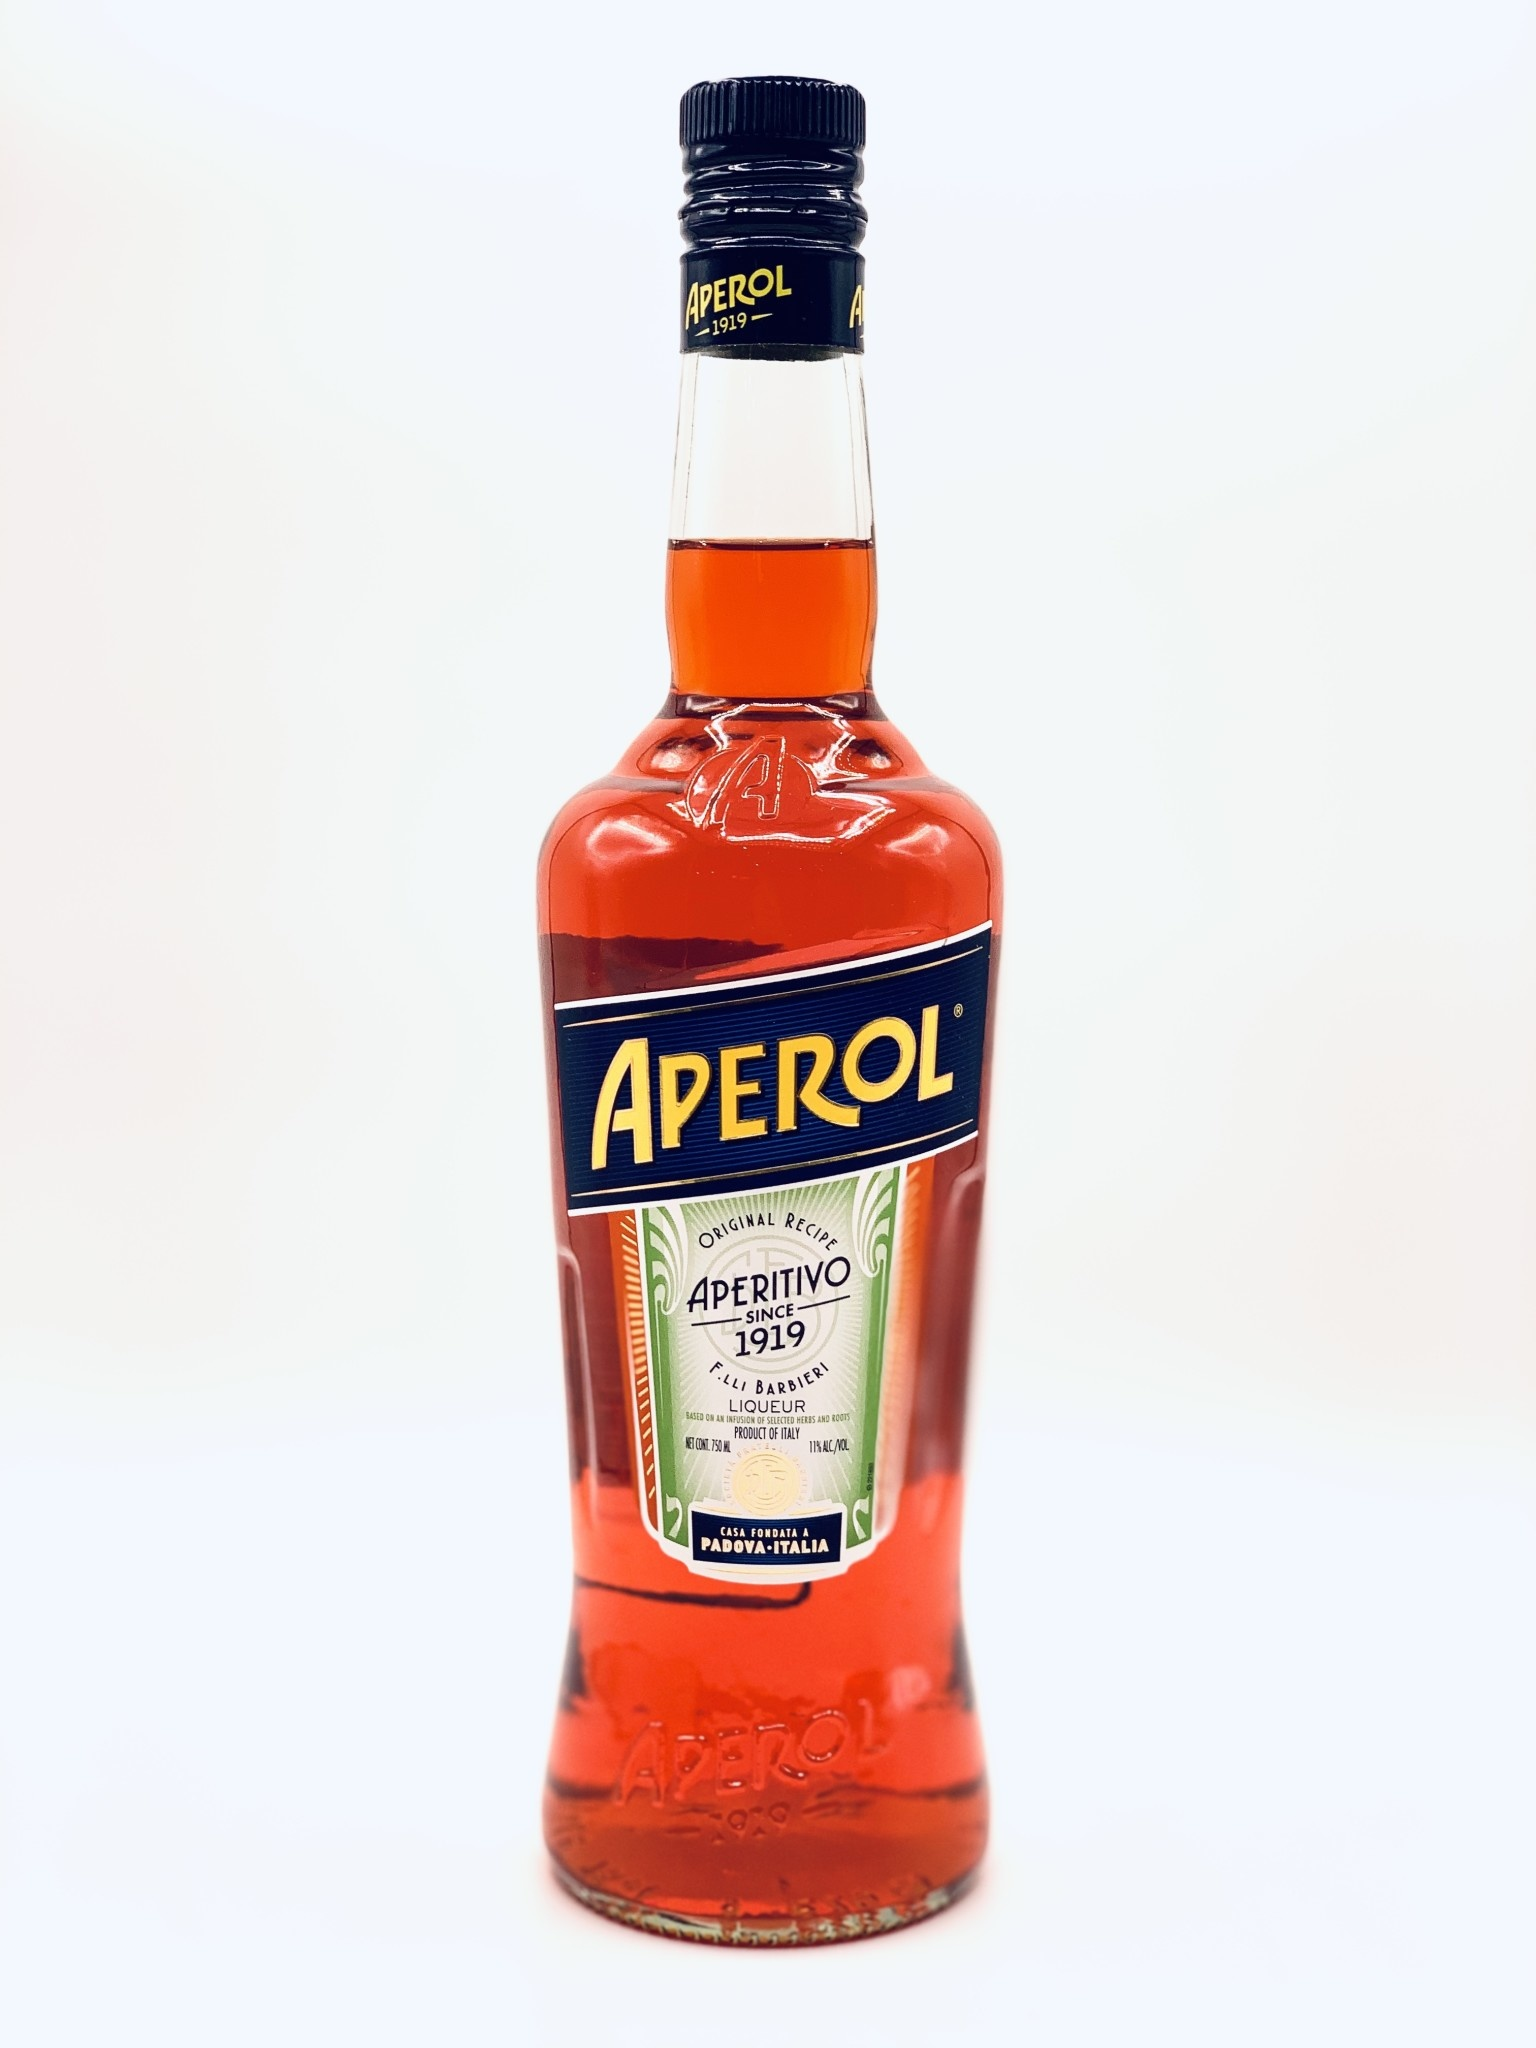 Aperol Aperitivo Liqueur Frateli Barbieri  750ml